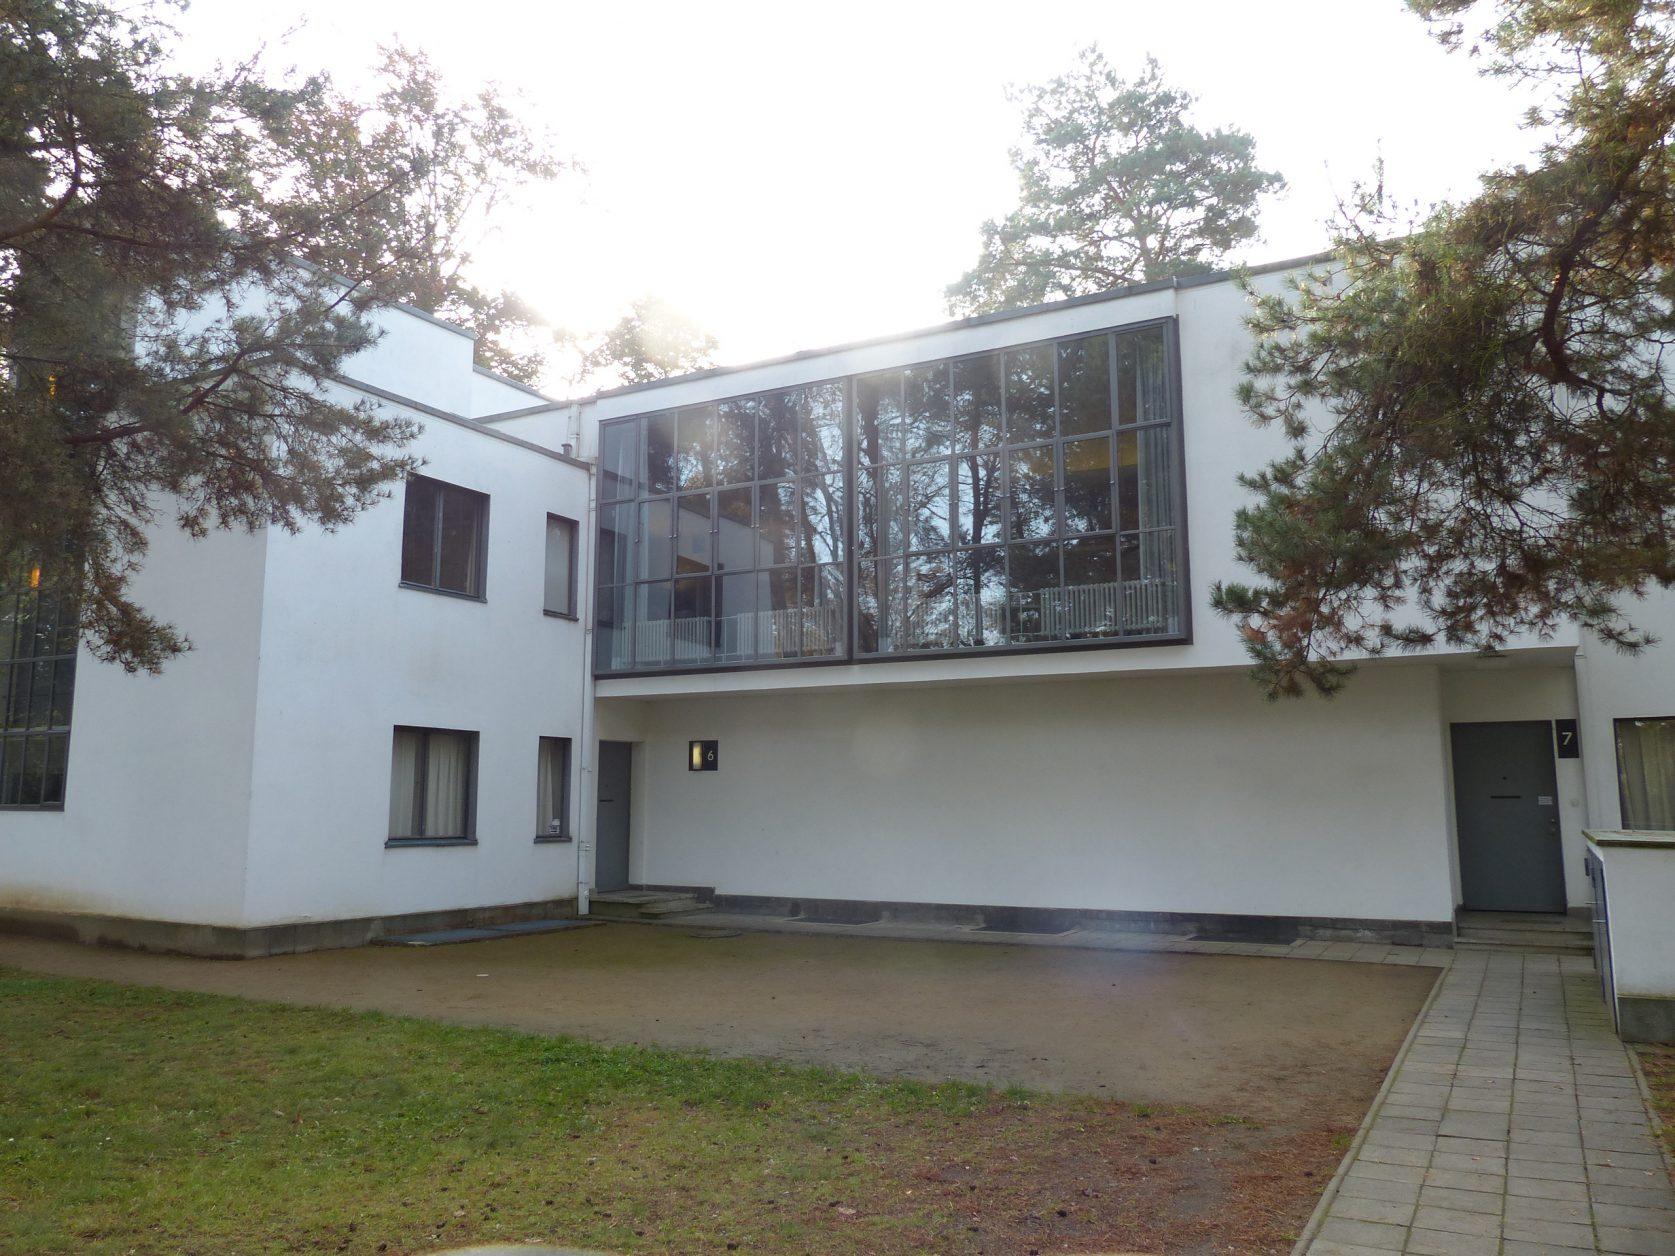 Meisterhaus in Dessau